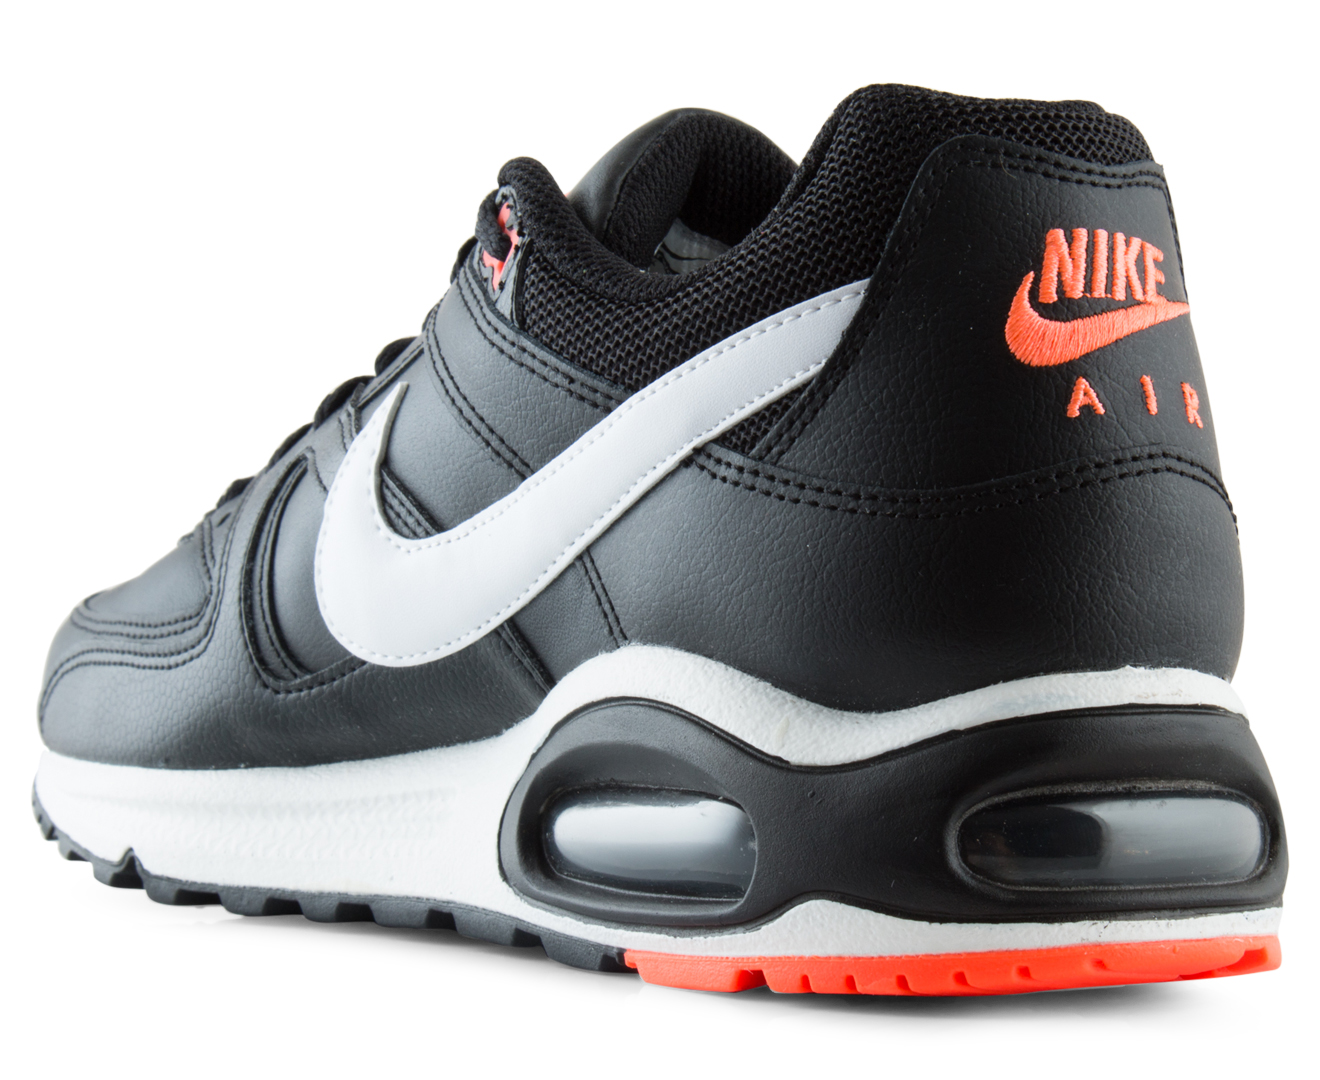 b4888d2914 Nike Men's Air Max Command Leather Shoe - Black/White/Bright Mango |  Catch.com.au